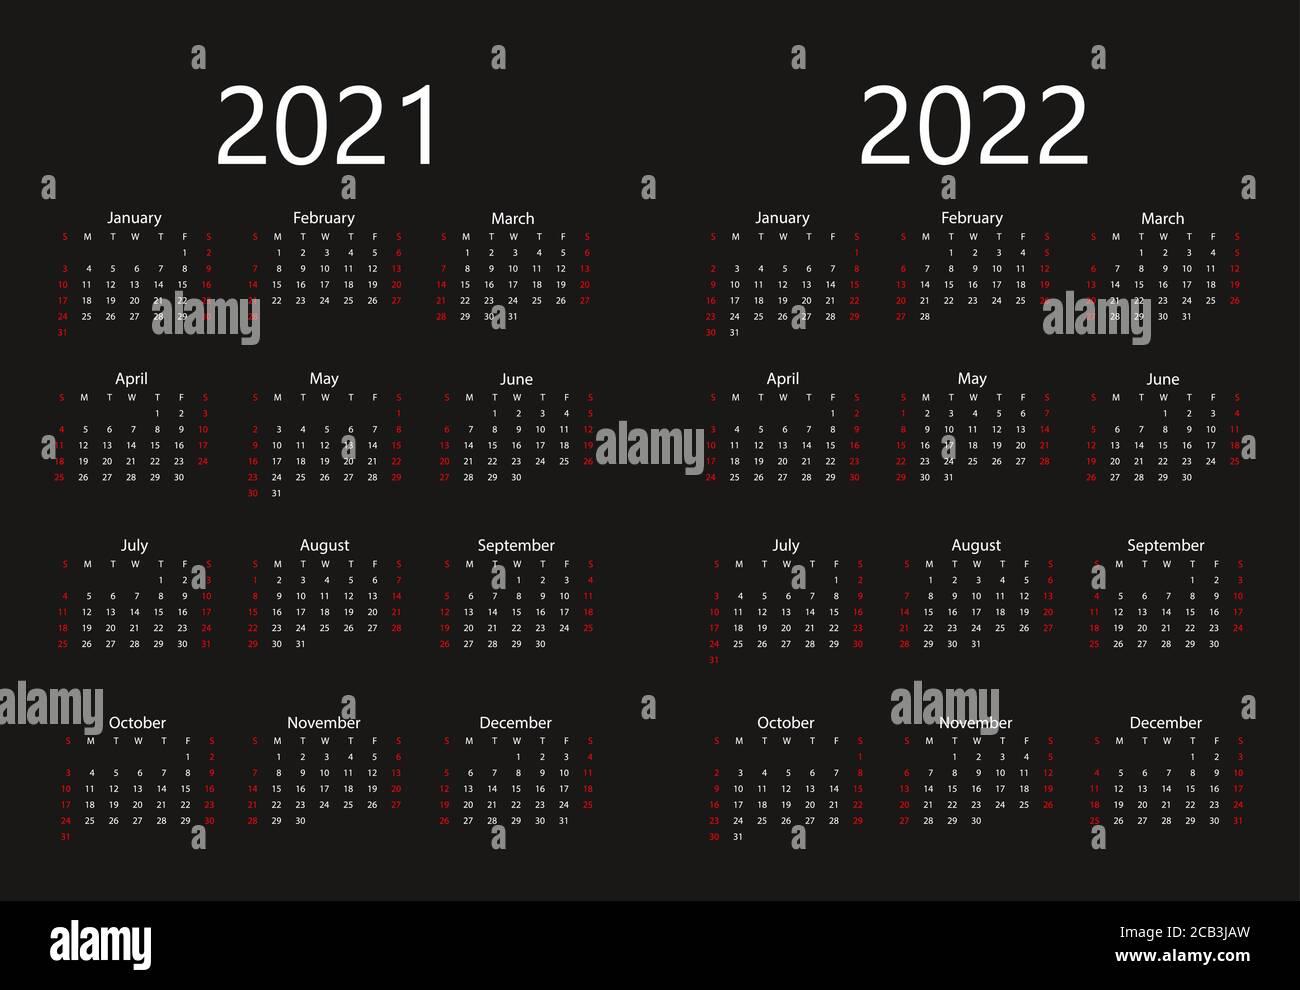 Utsa Fall 2022 Calendar.Calendar 2021 Bryn Mawr Academic Calendar 2021 2022